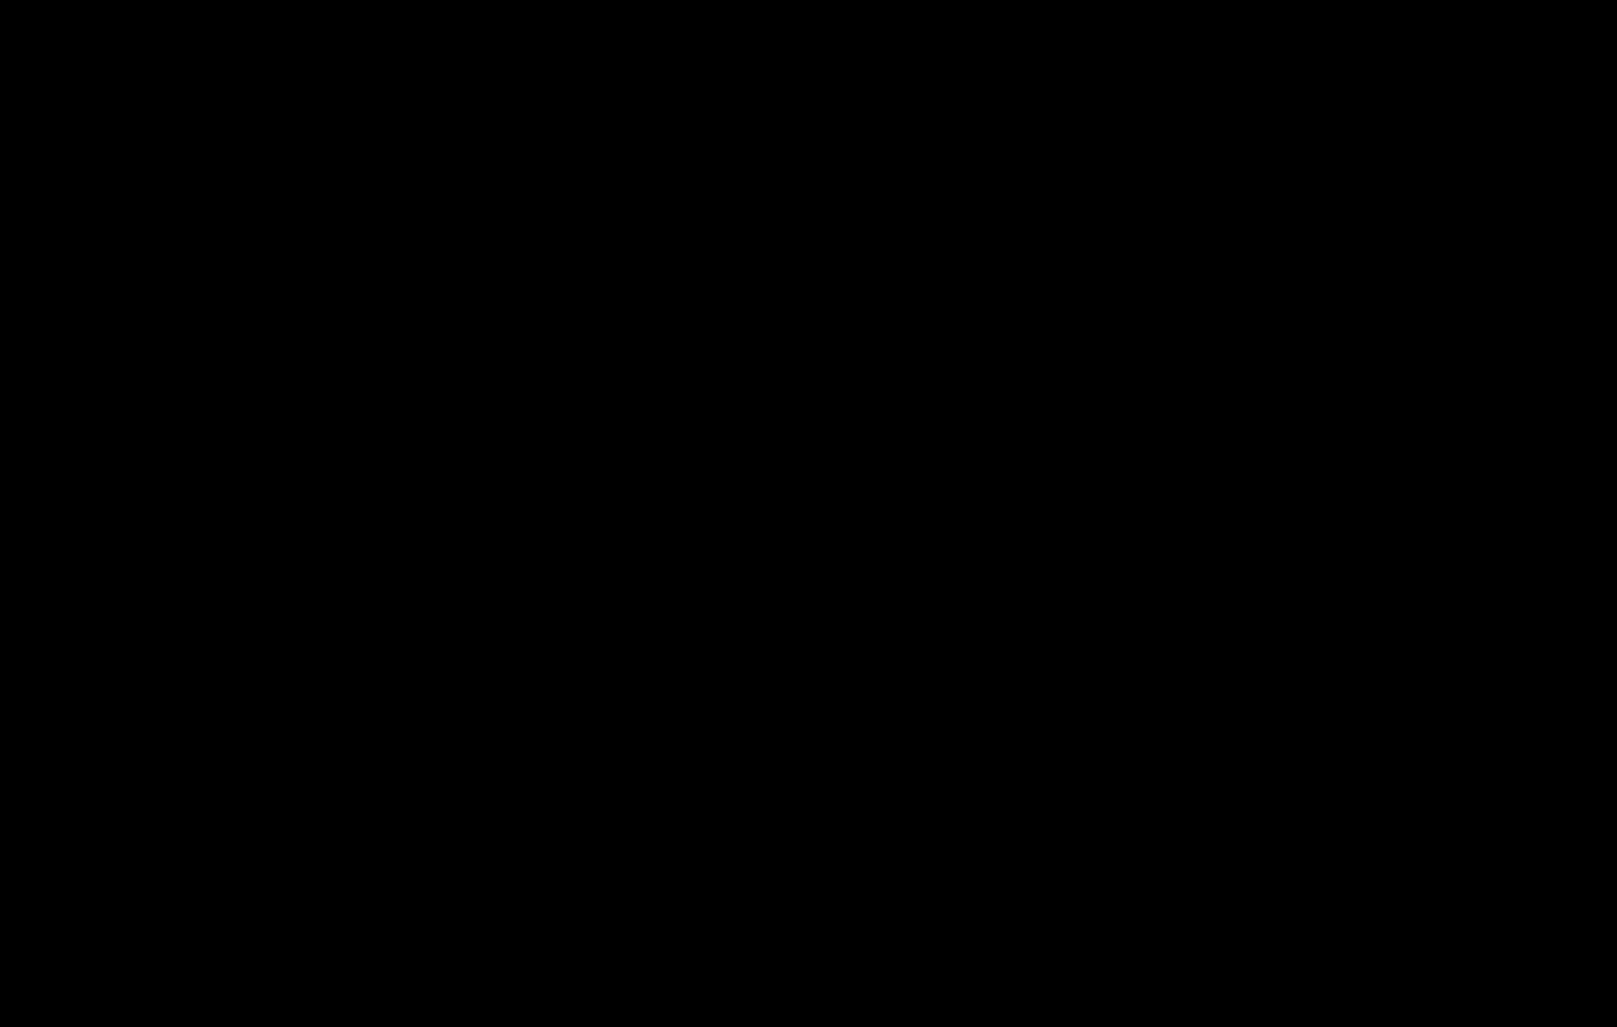 Womanology Alternative Logo - Black.png